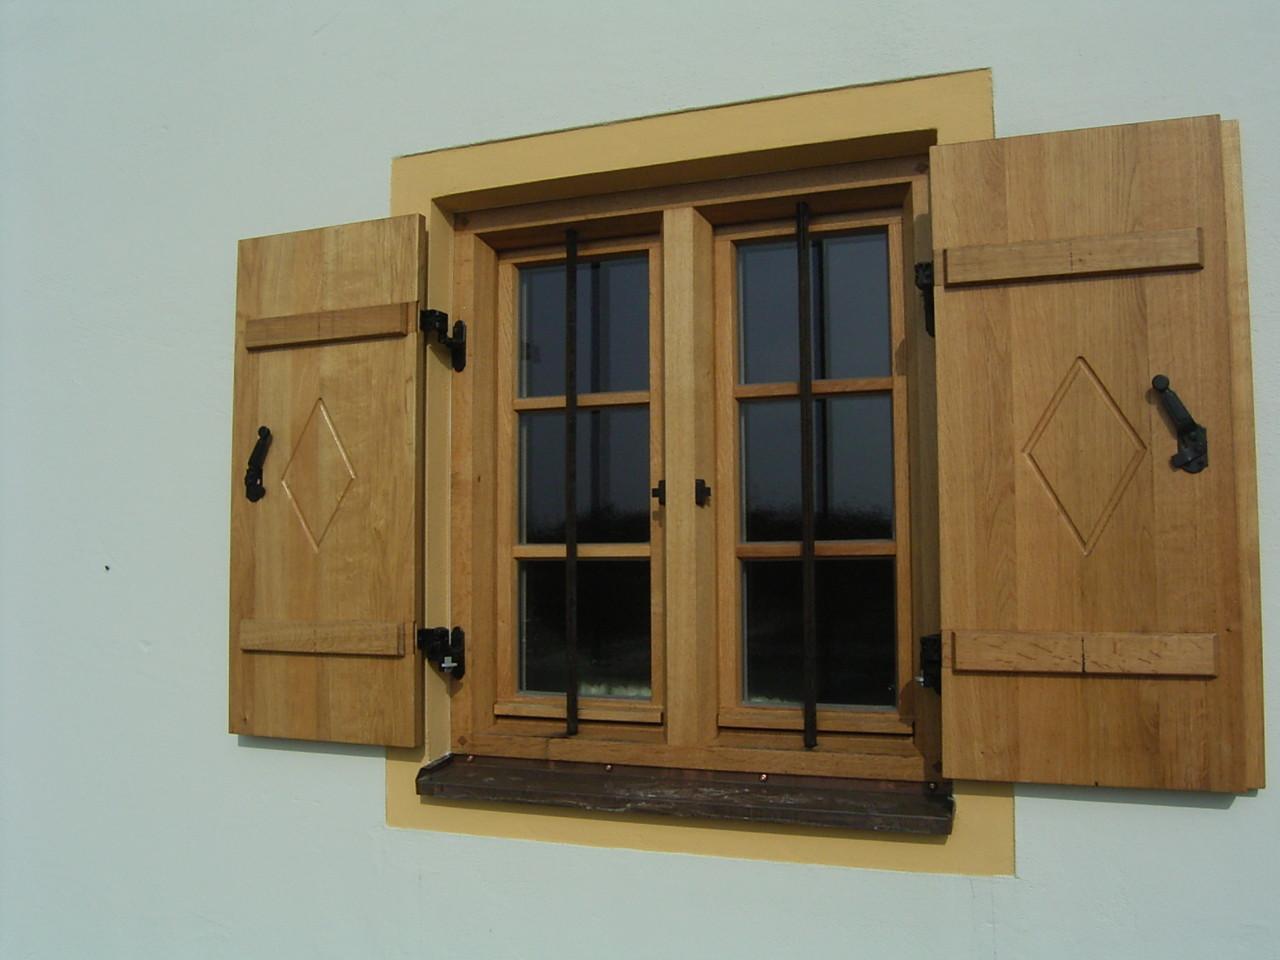 Fenster antik schreinerei berger for Fenster 0 5 ug